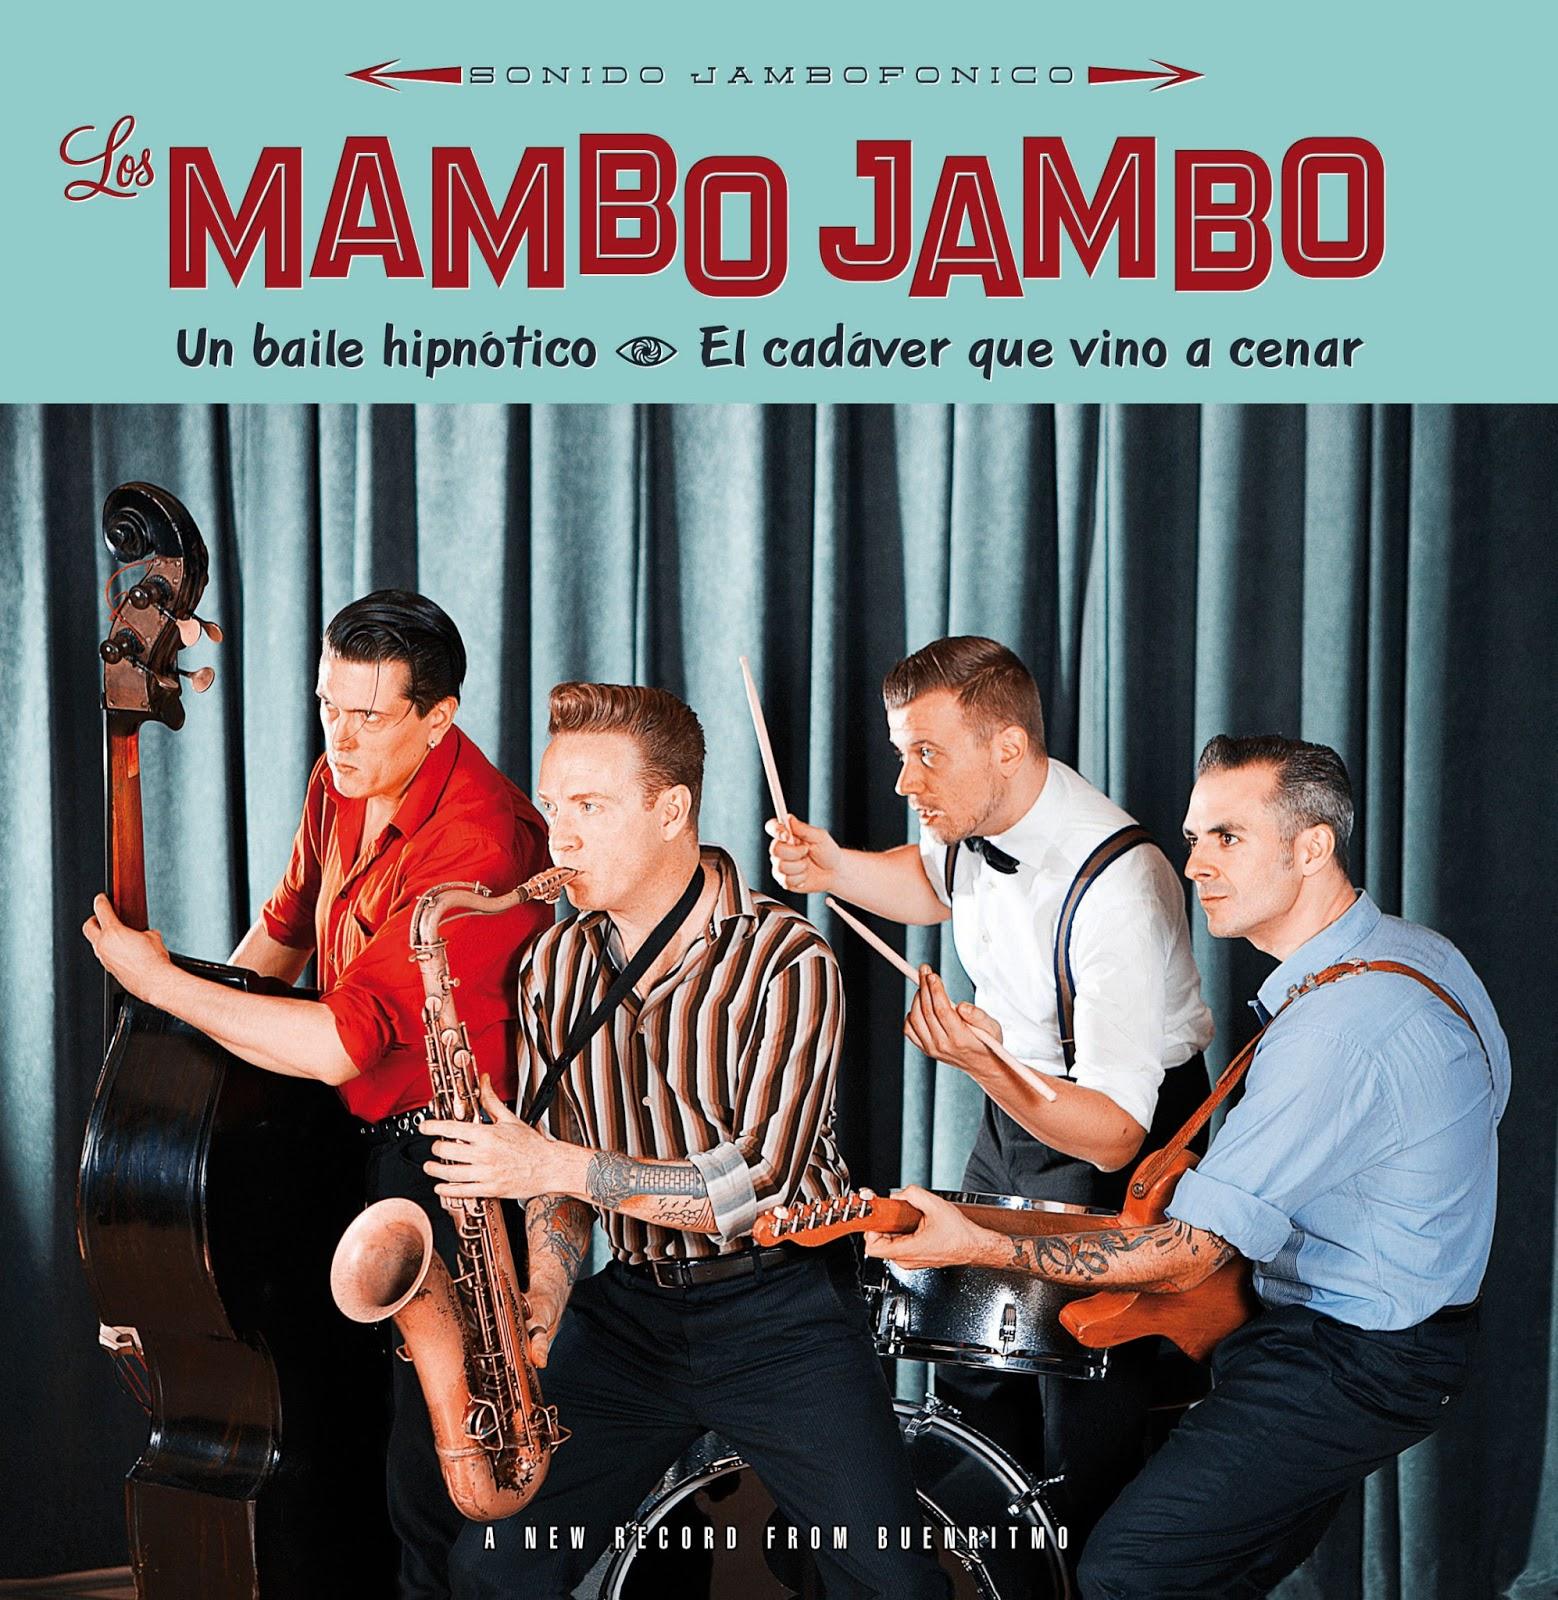 areimagen: Mambo Jambo concierto Kafé Antzokia Bilbao 25/8/2012